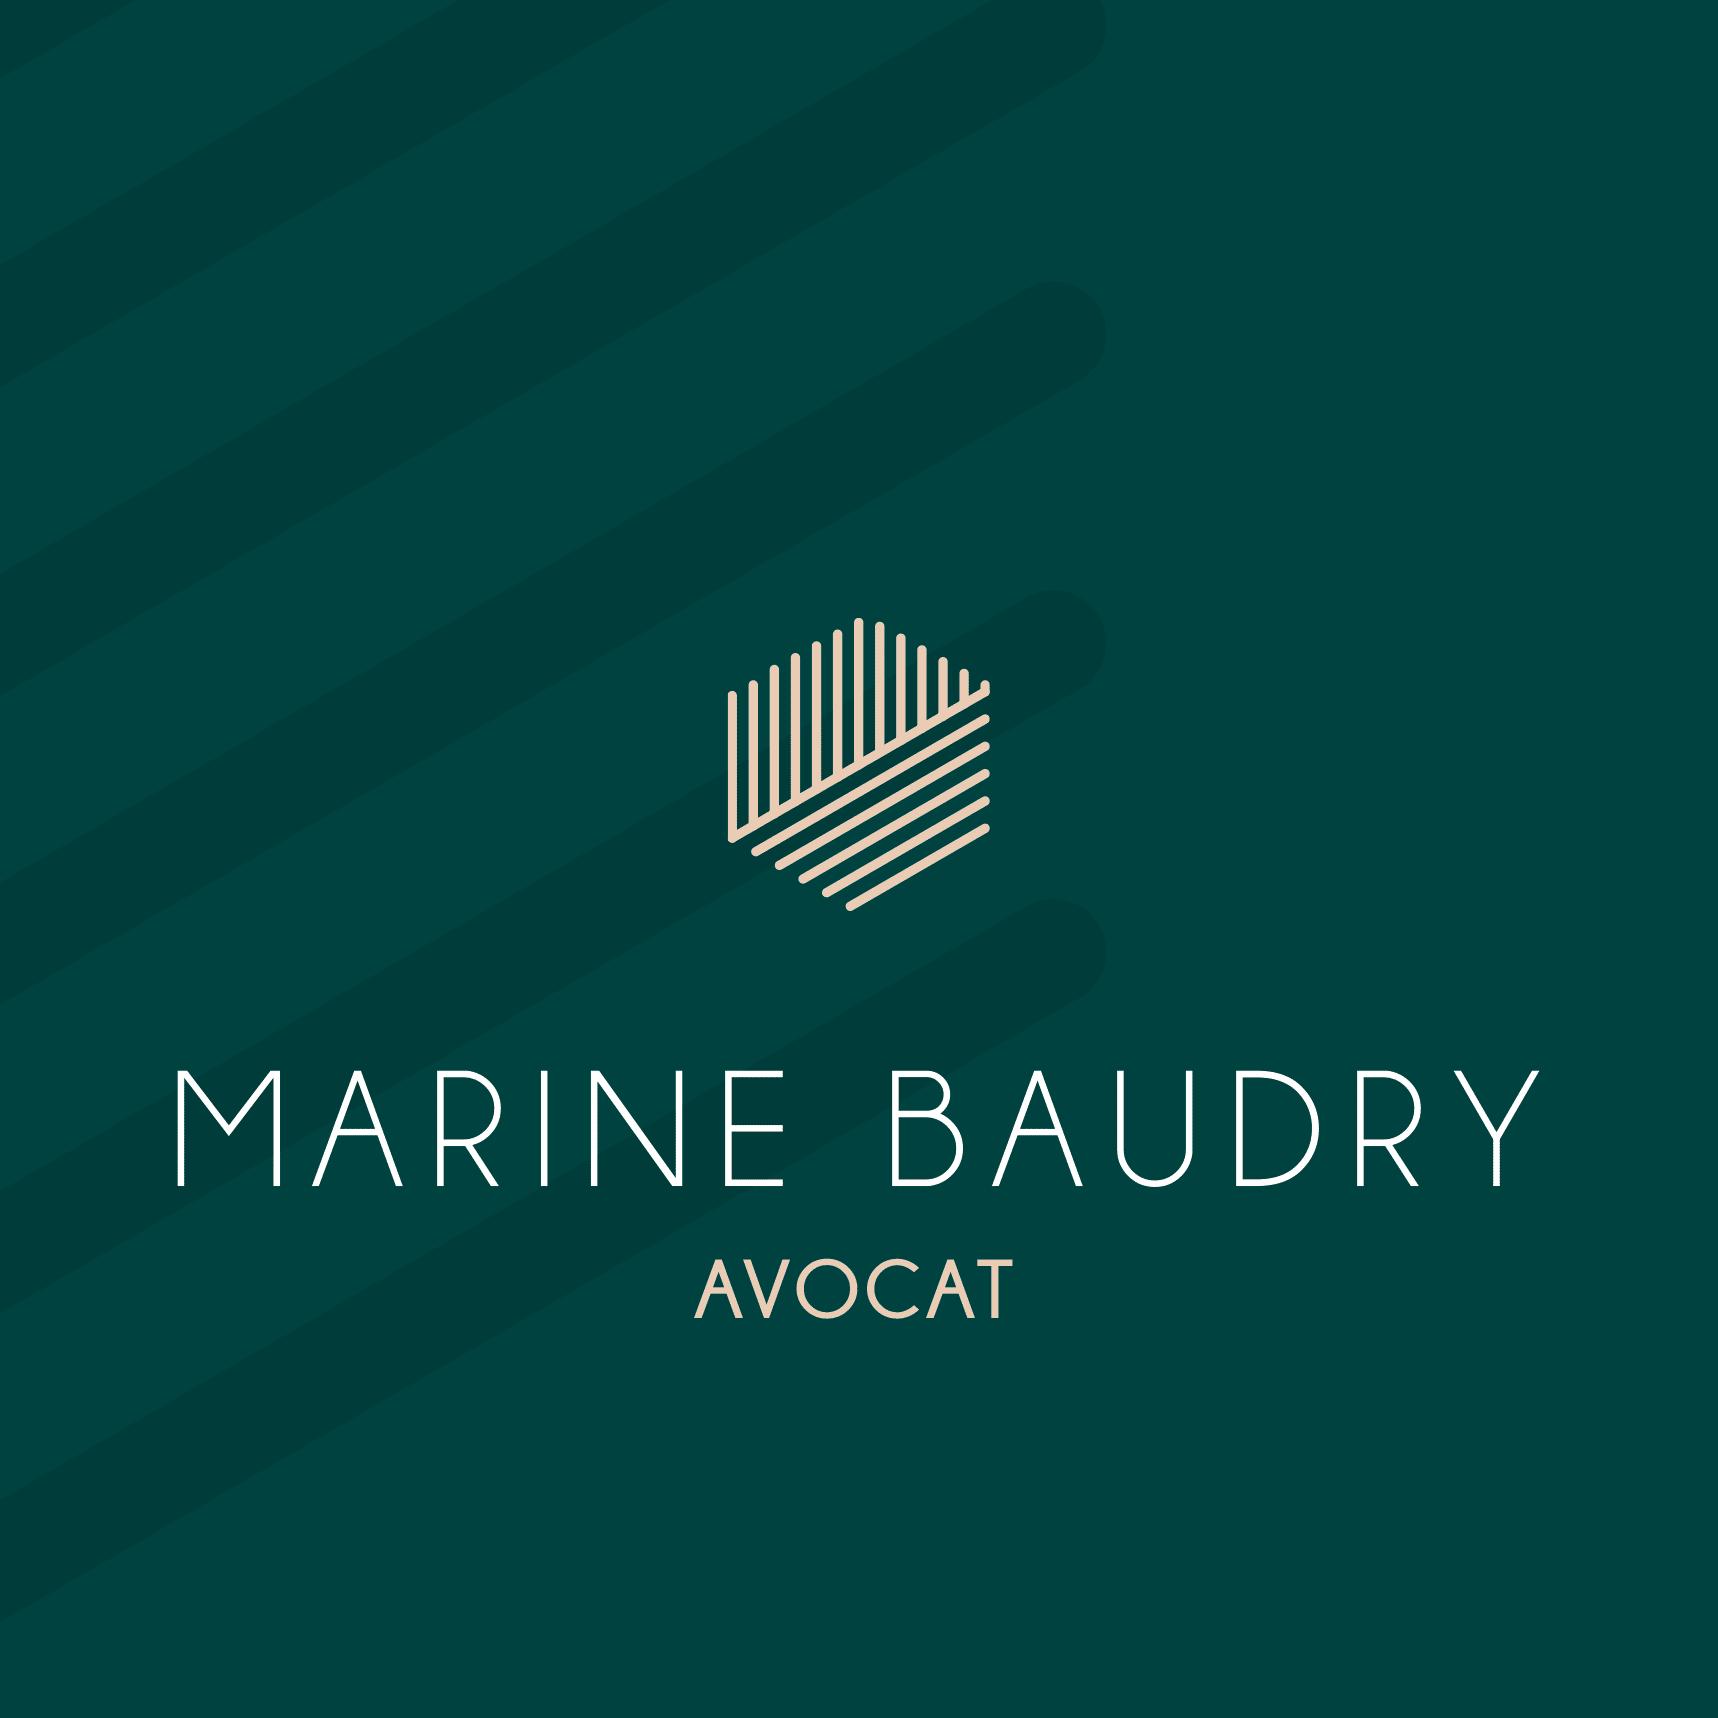 https://f2m2j6x3.rocketcdn.me/wp-content/uploads/2021/05/marine-baudry-avocat-larochelle.png